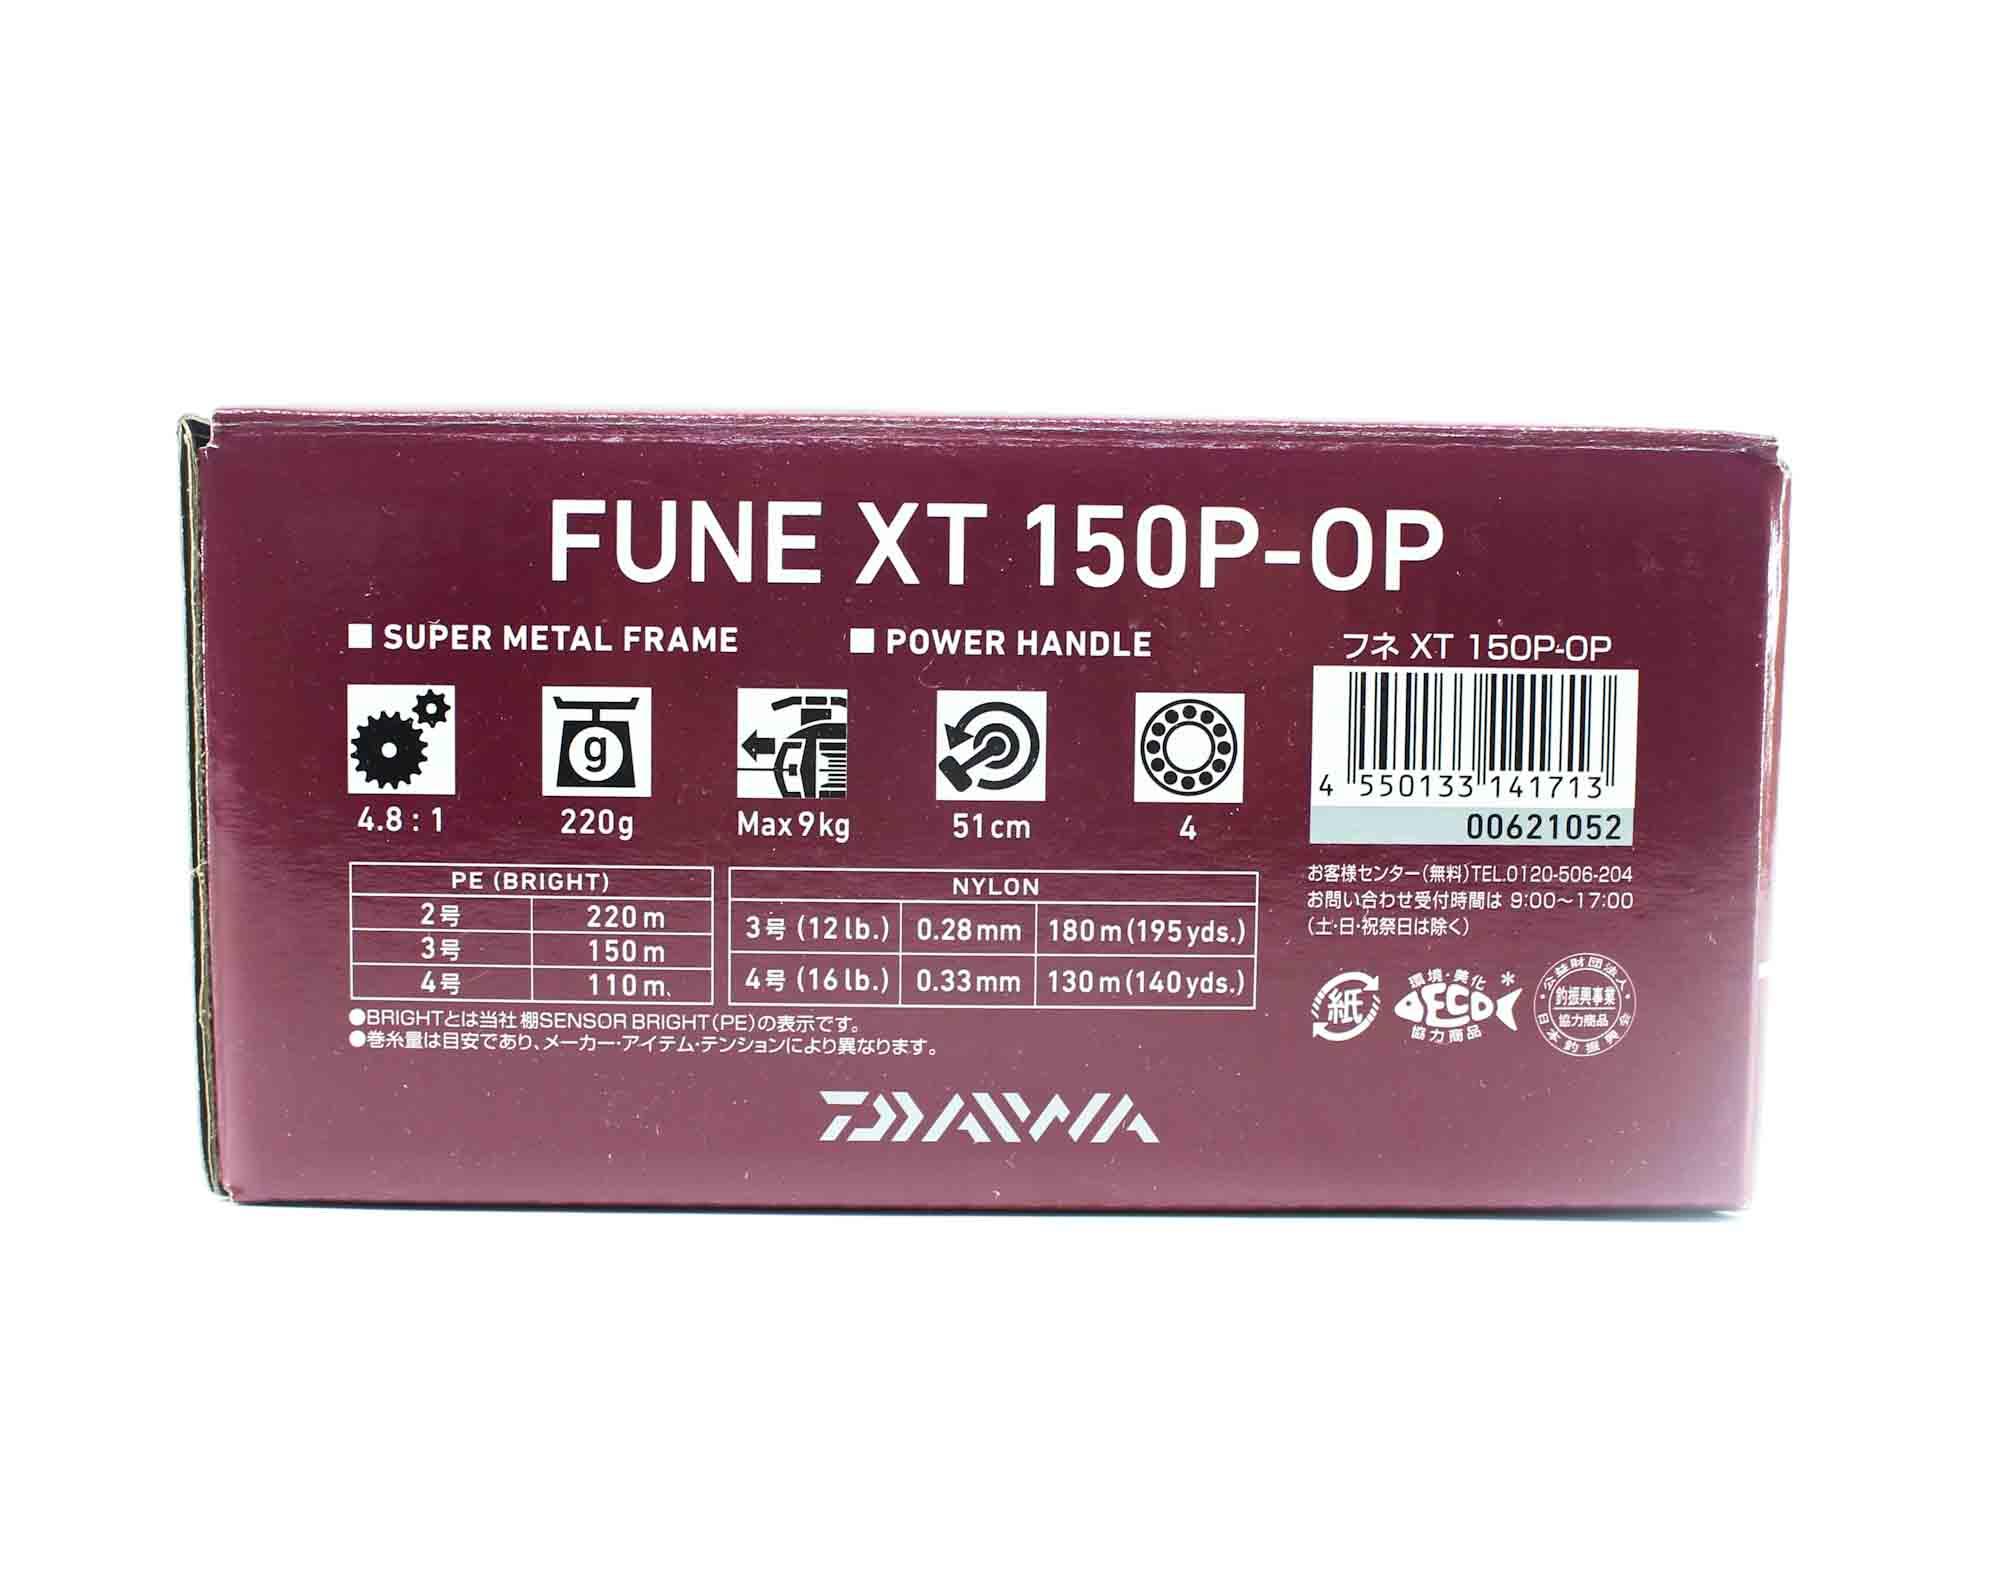 Daiwa Reel Baitcast 20 Fune XT 150P-OP Right Hand (1713)